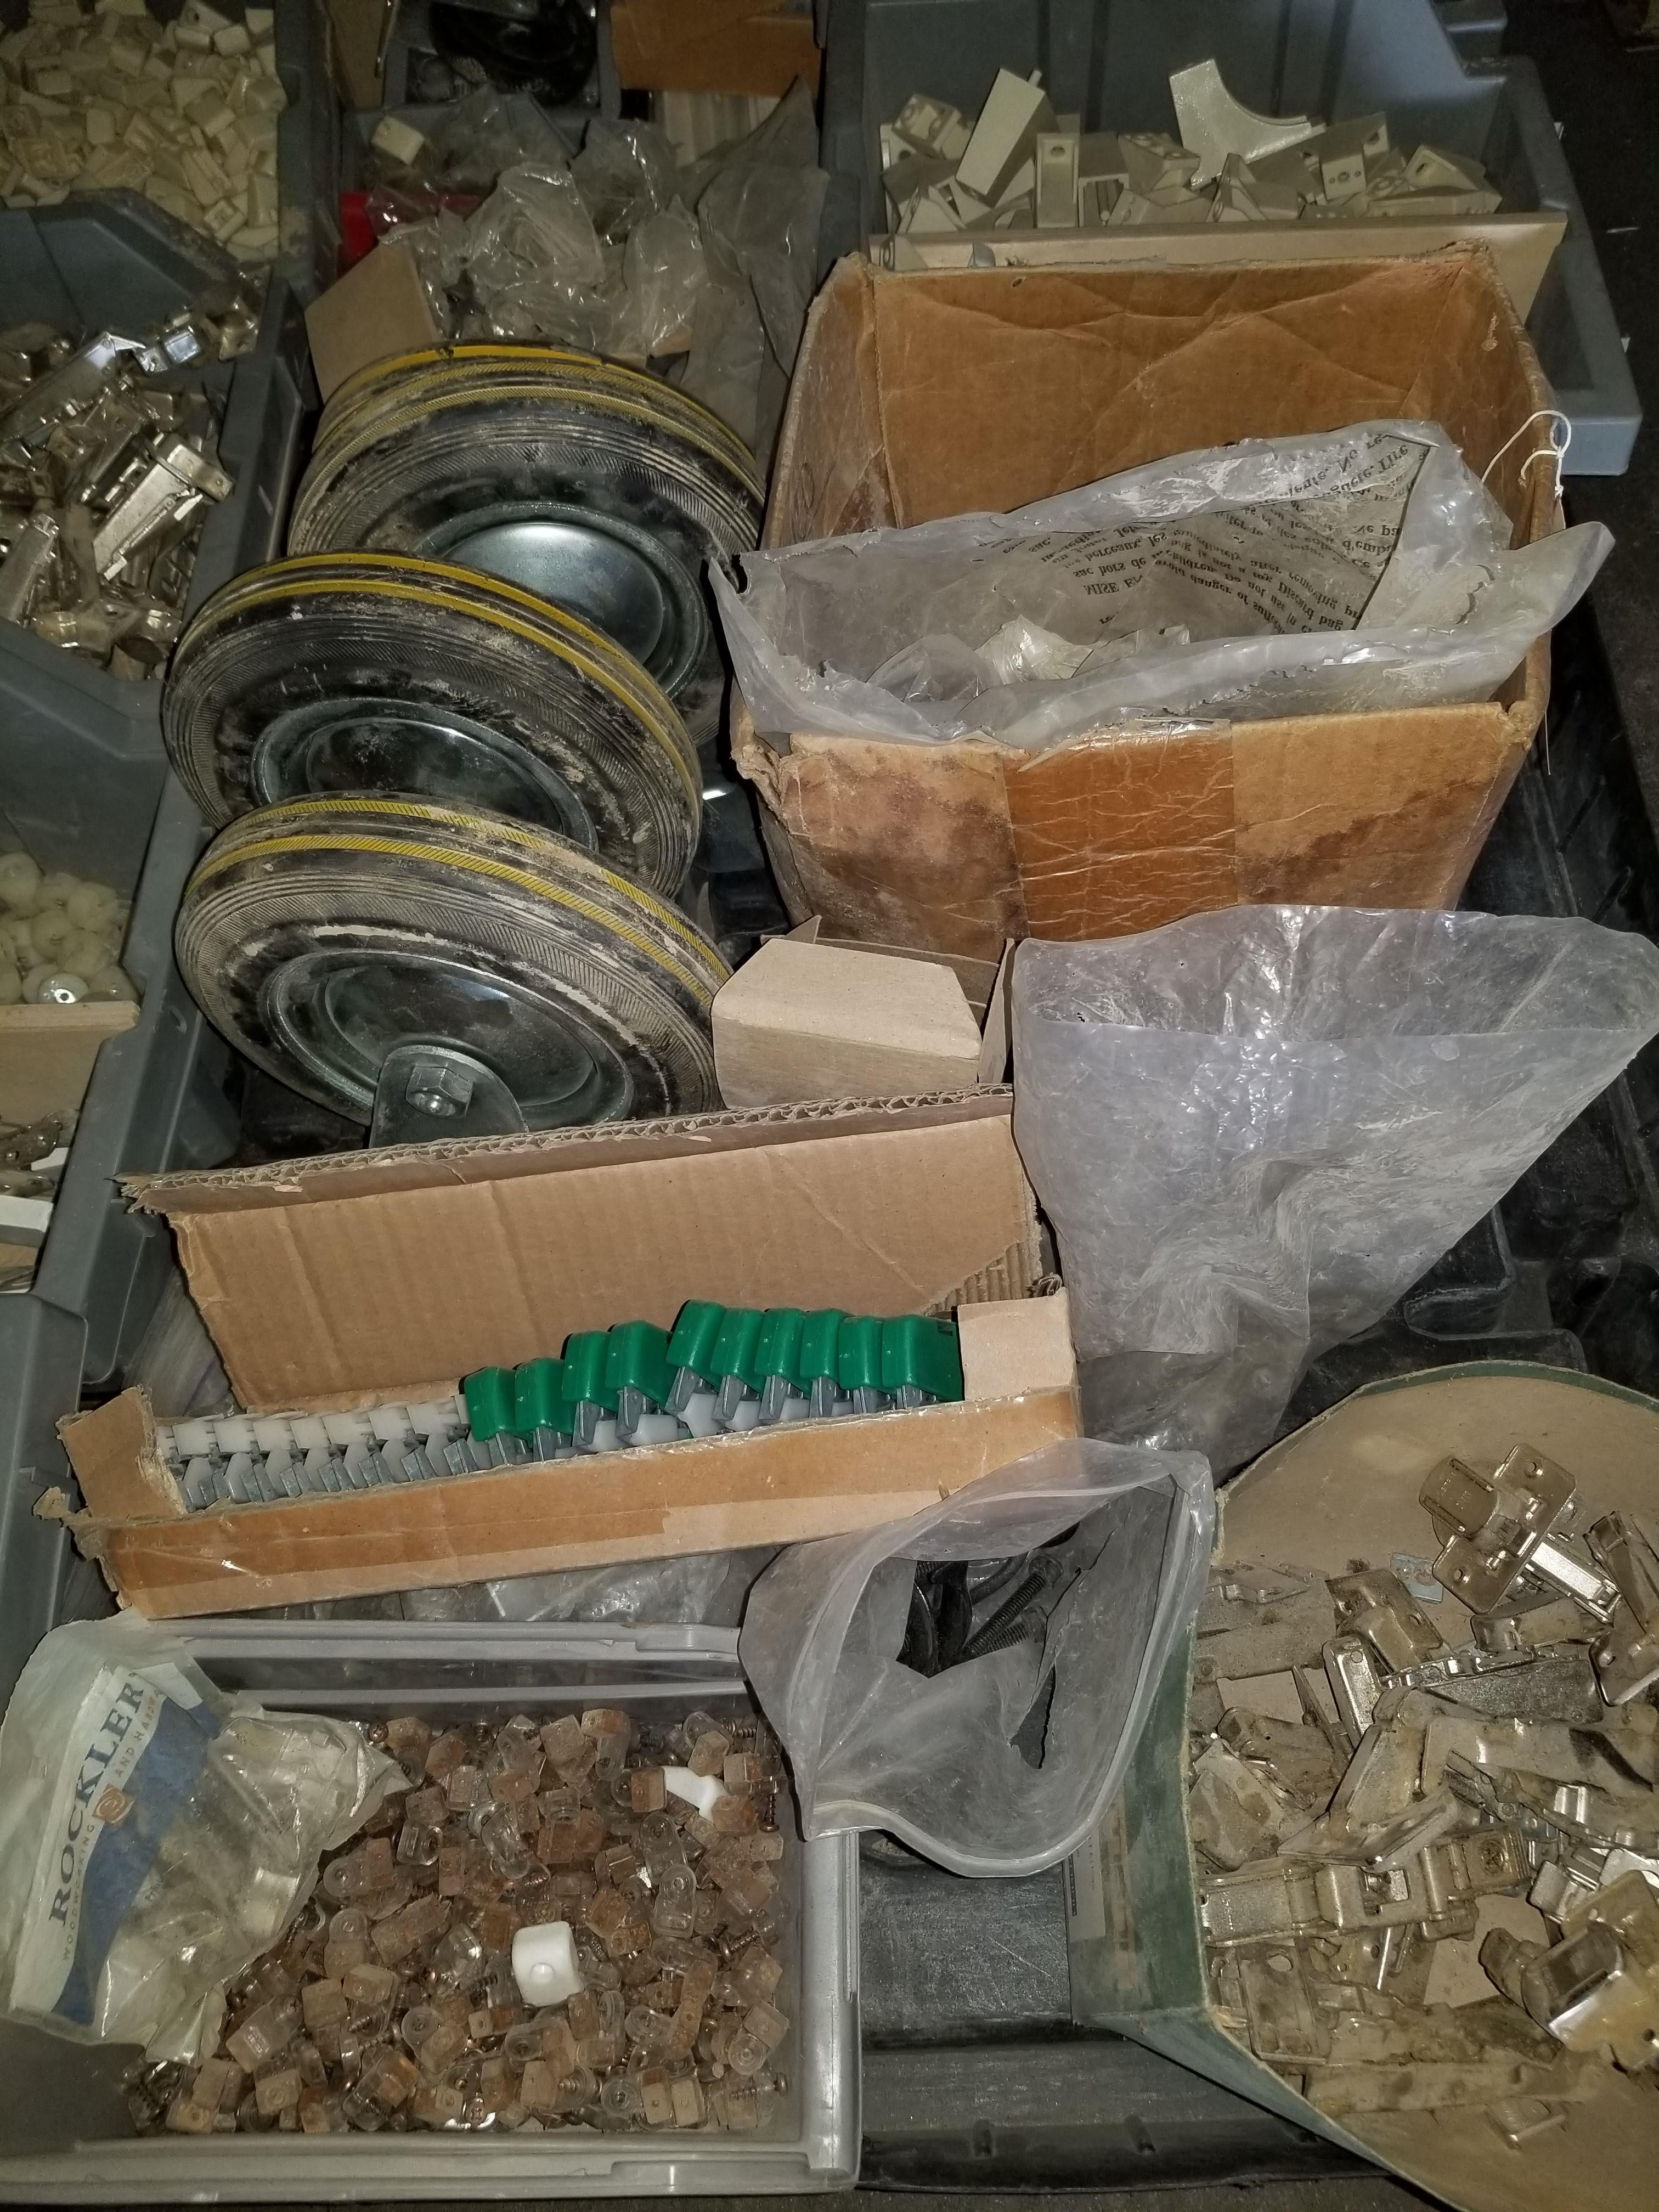 Pallet of Misc. Hardware, Hinges, Screws, Spacers, caster wheels, & More - Image 3 of 6